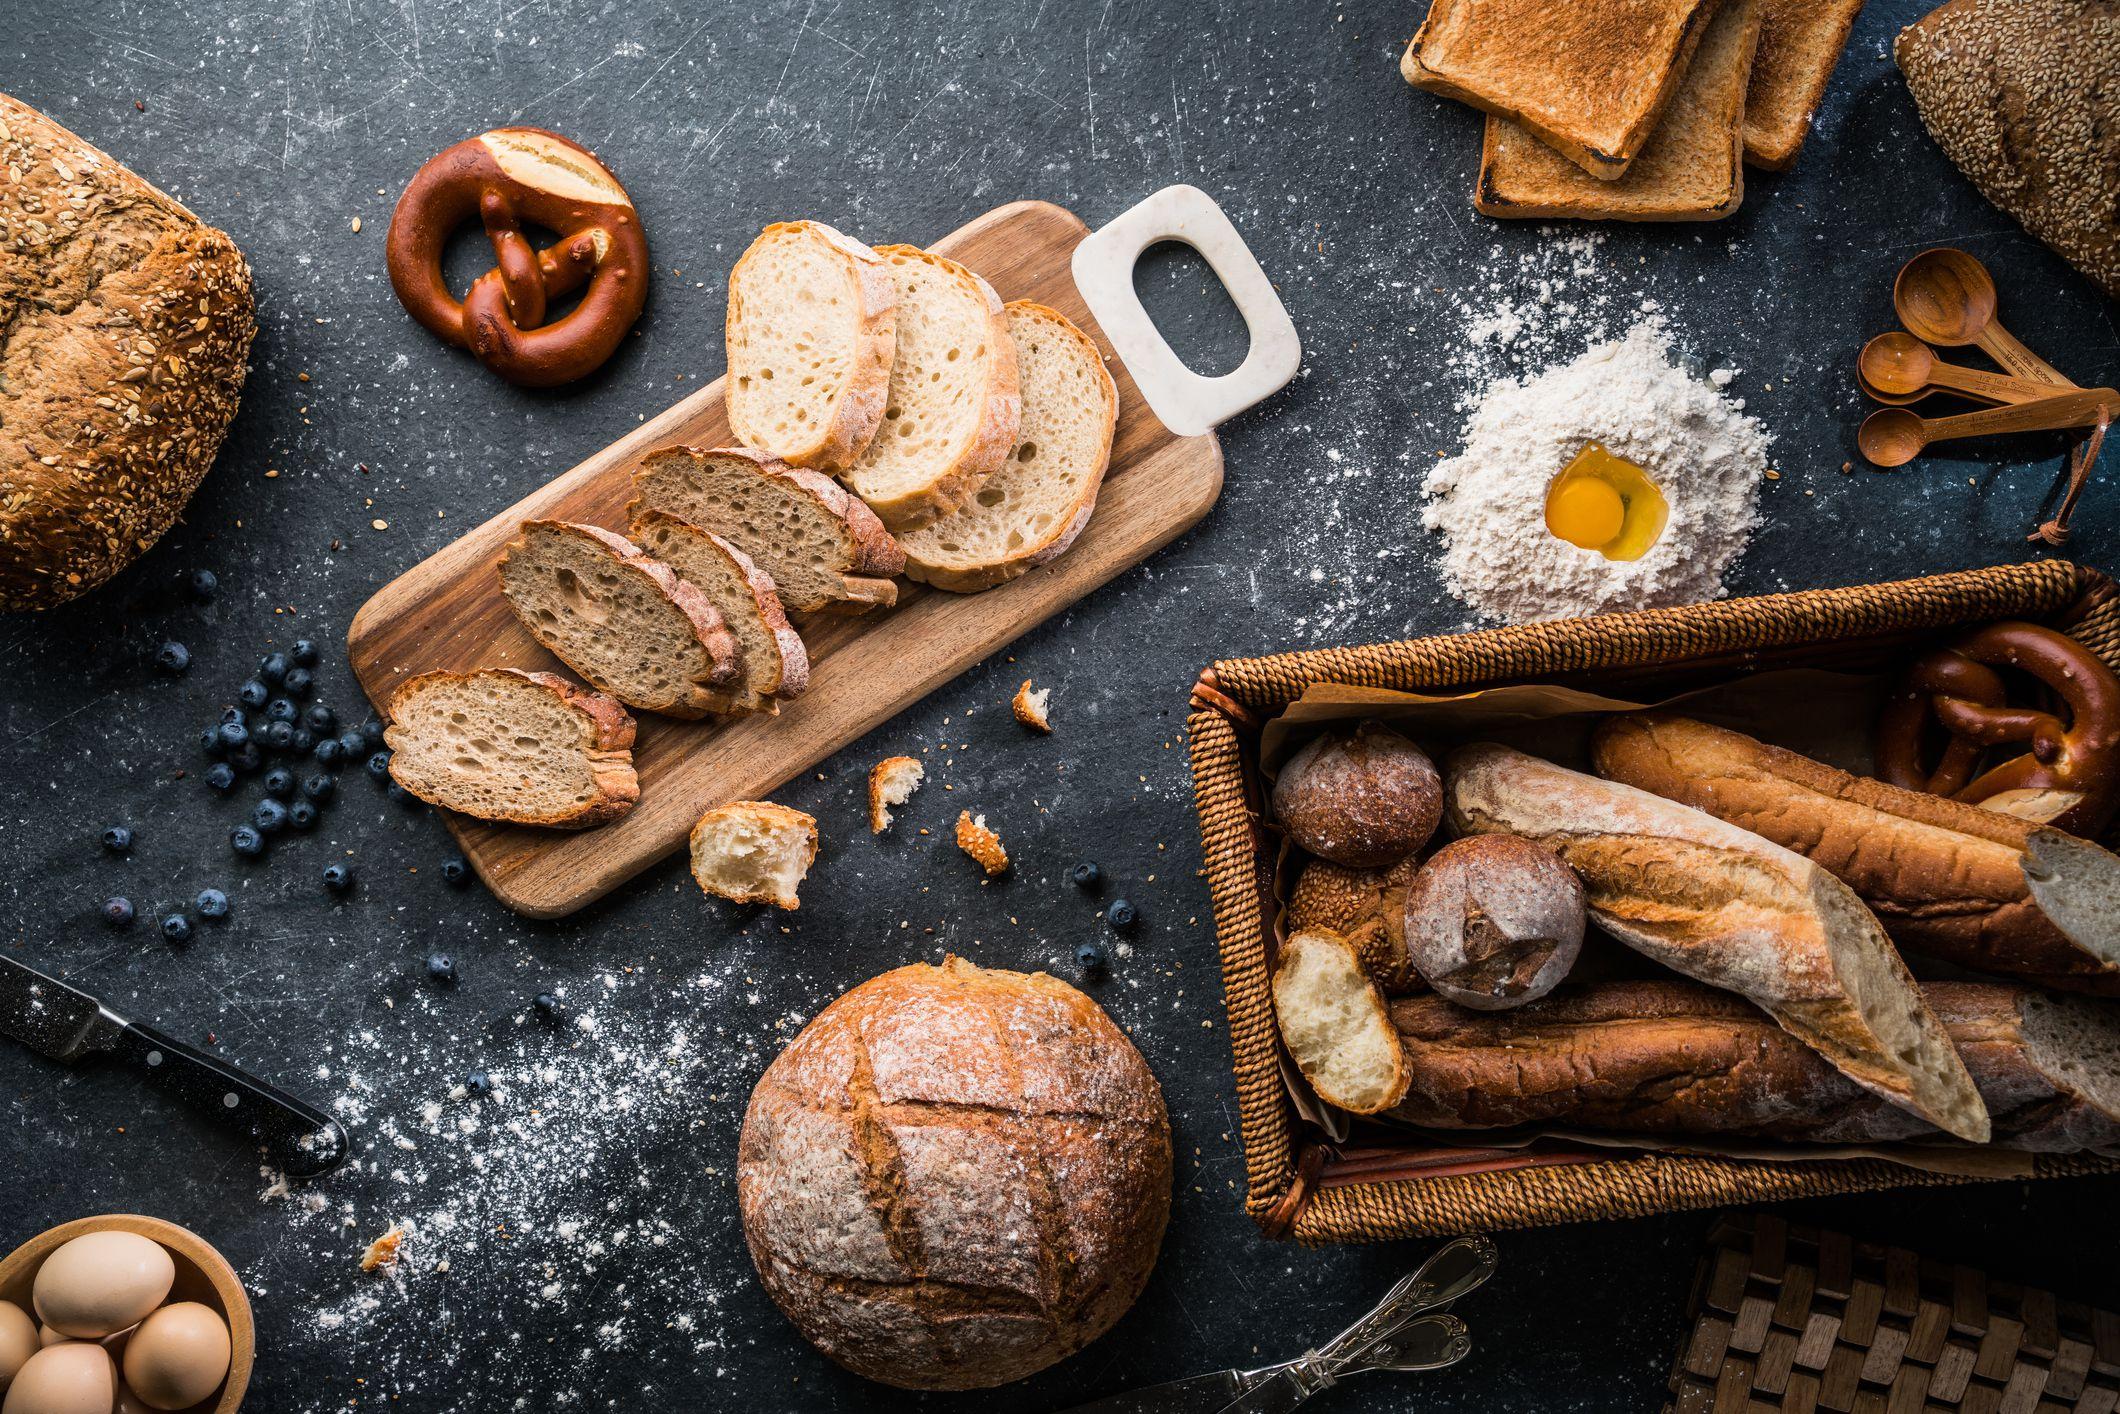 8 Surprising Symptoms of a Gluten Allergy